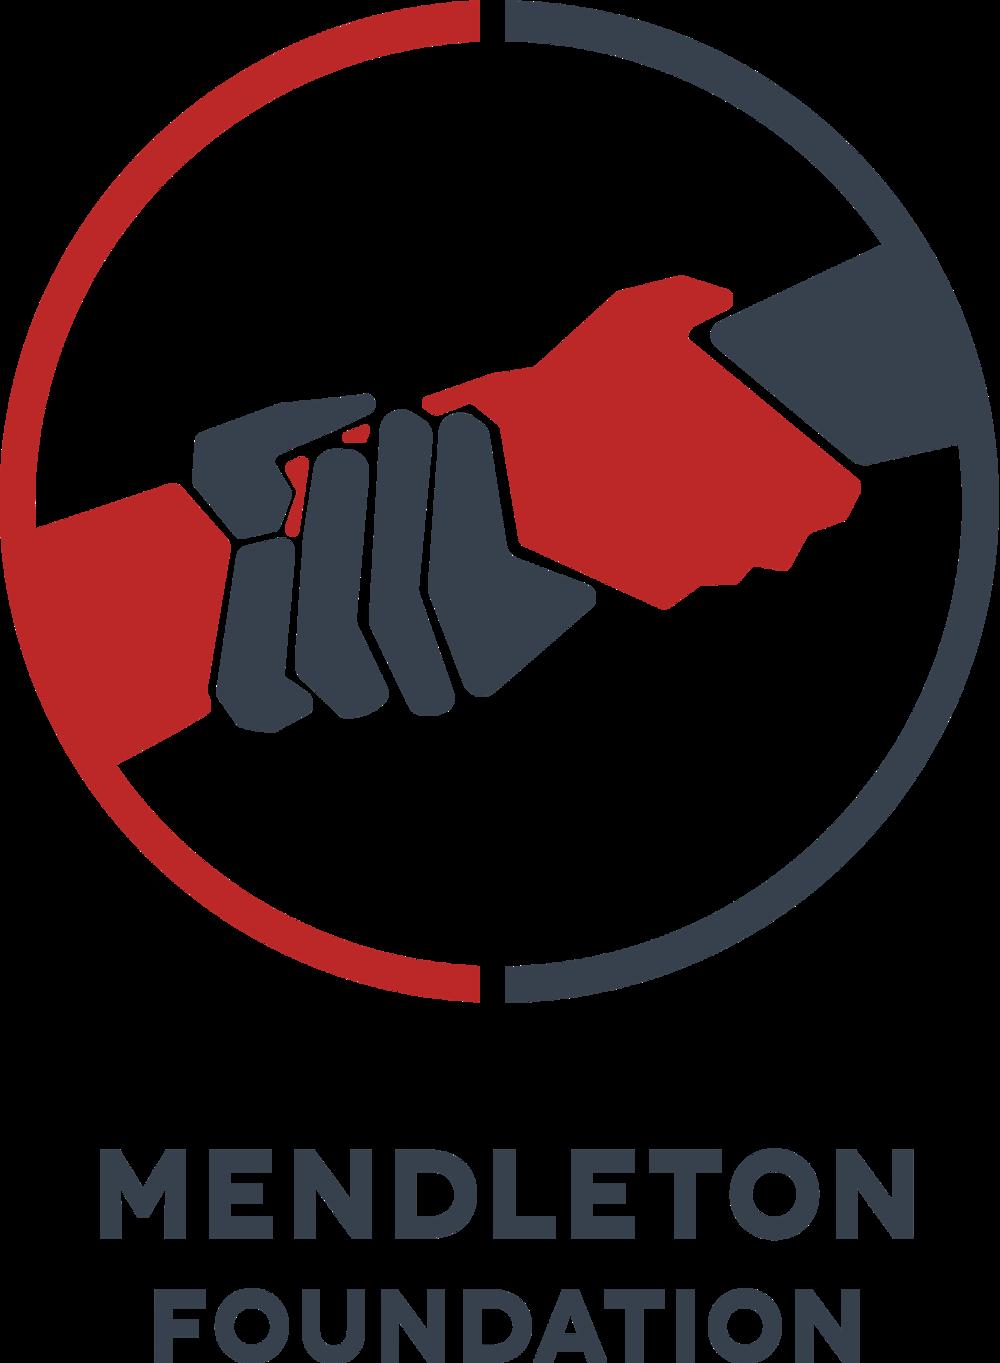 mendleton_logo_color_print_300dpi.png